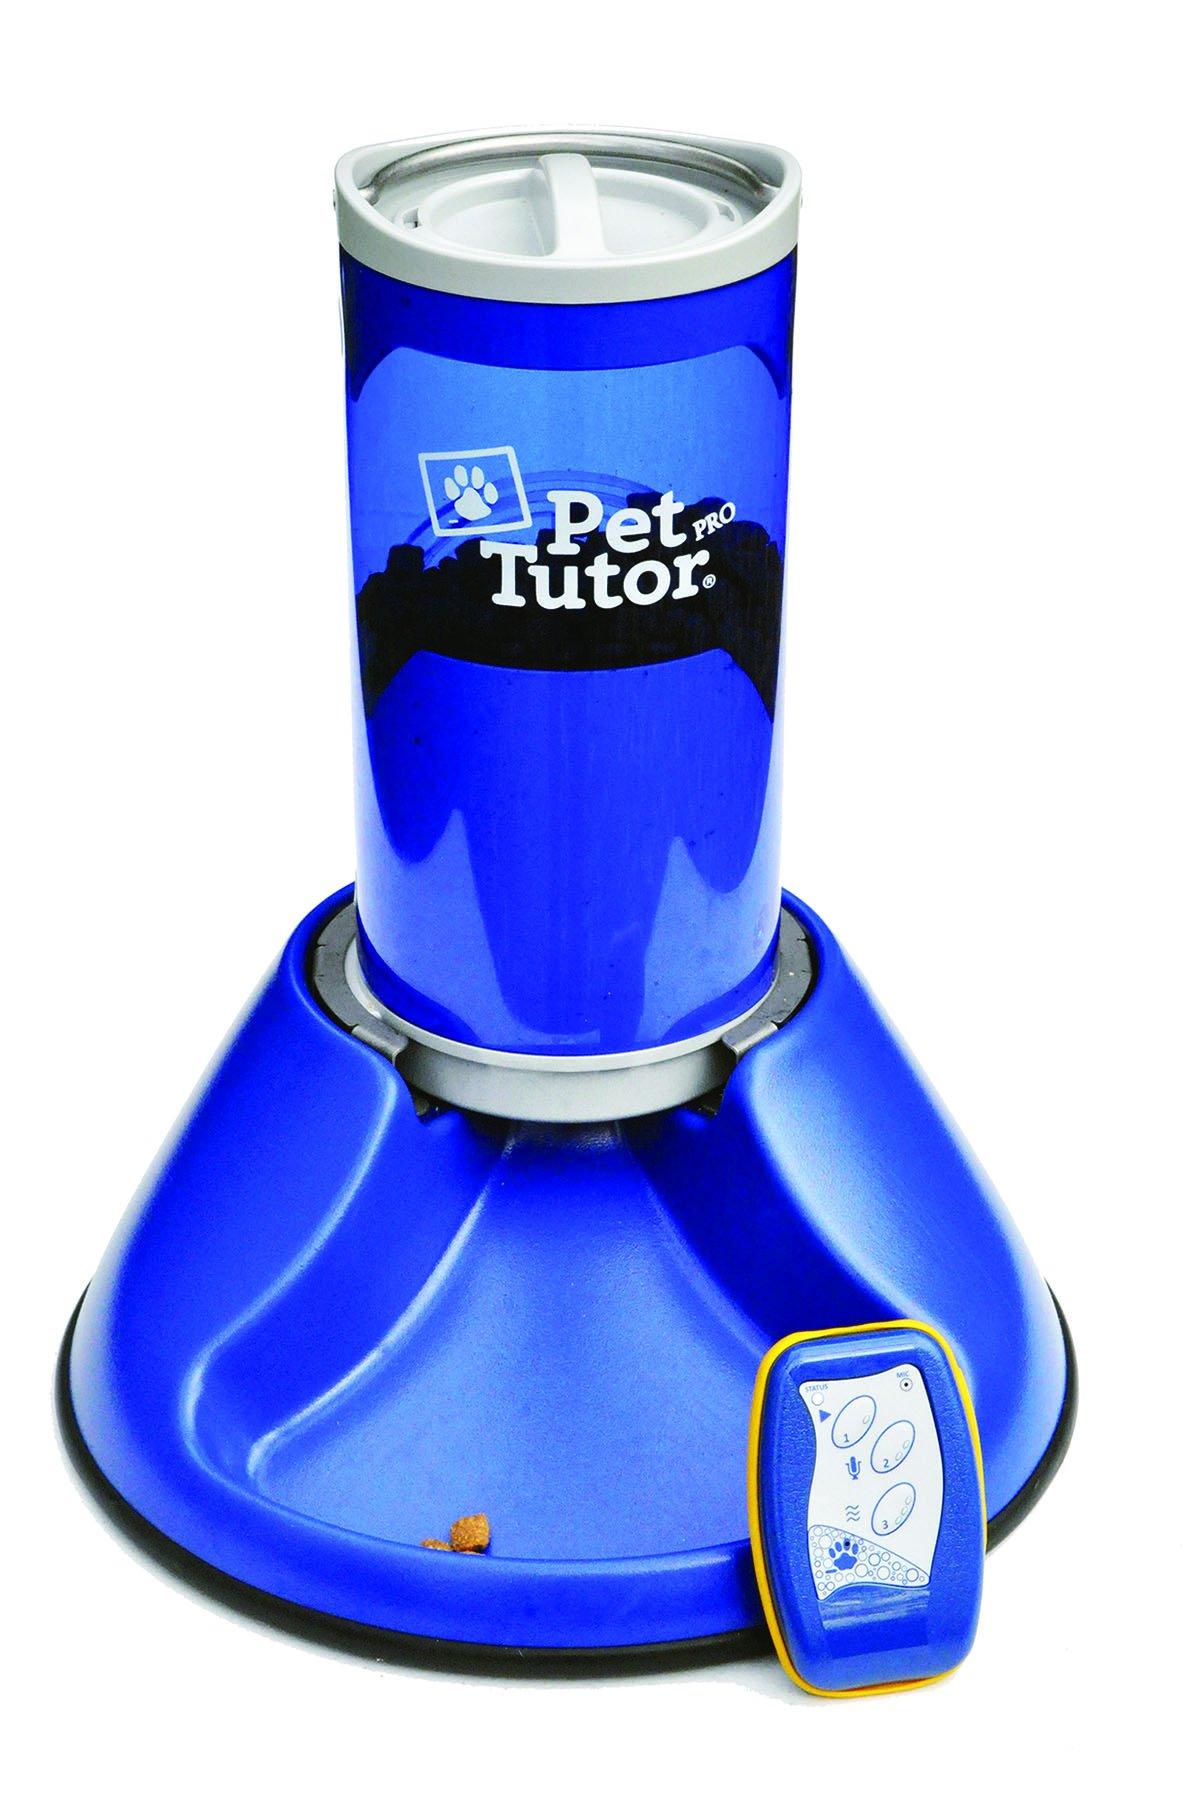 Pet Tutor dog treat dispenser